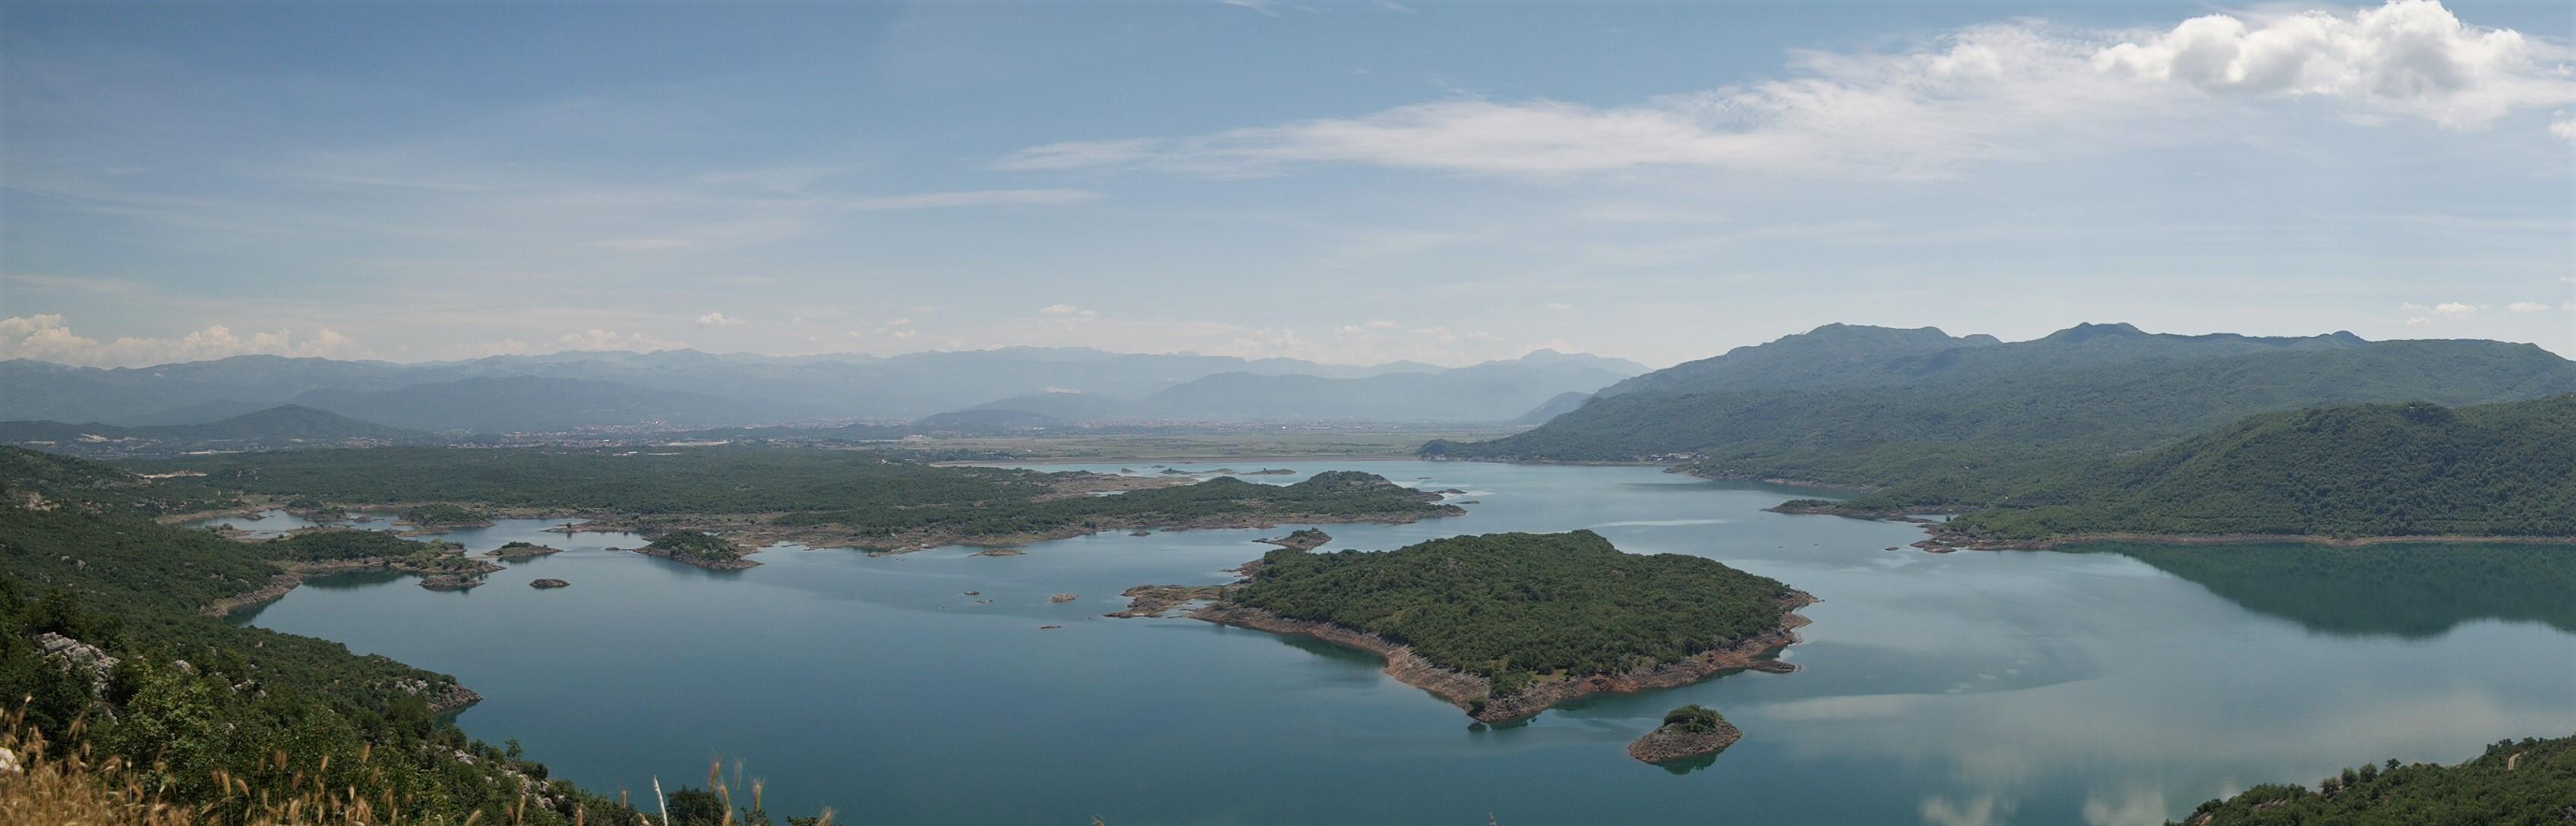 Blick auf den Slansko Jezero